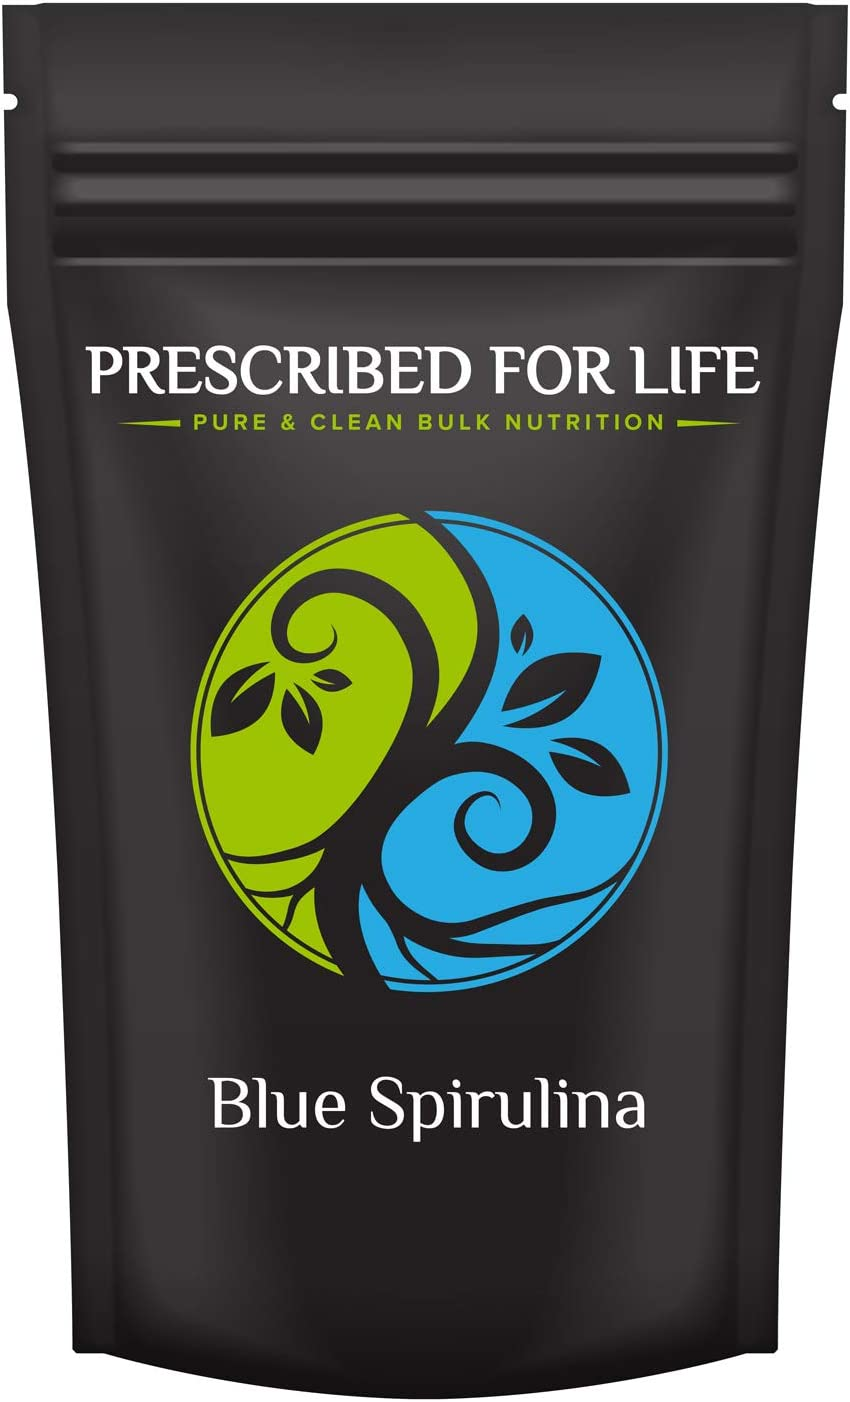 Prescribed for Life Blue Spirulina Powder (2 oz) | 100% Pure Superfood | Gluten Free, Vegan, Non-GMO | Blue Algae Powder (Phycocyanin) | Packed with Protein, Vitamins, Minerals & Antioxidants